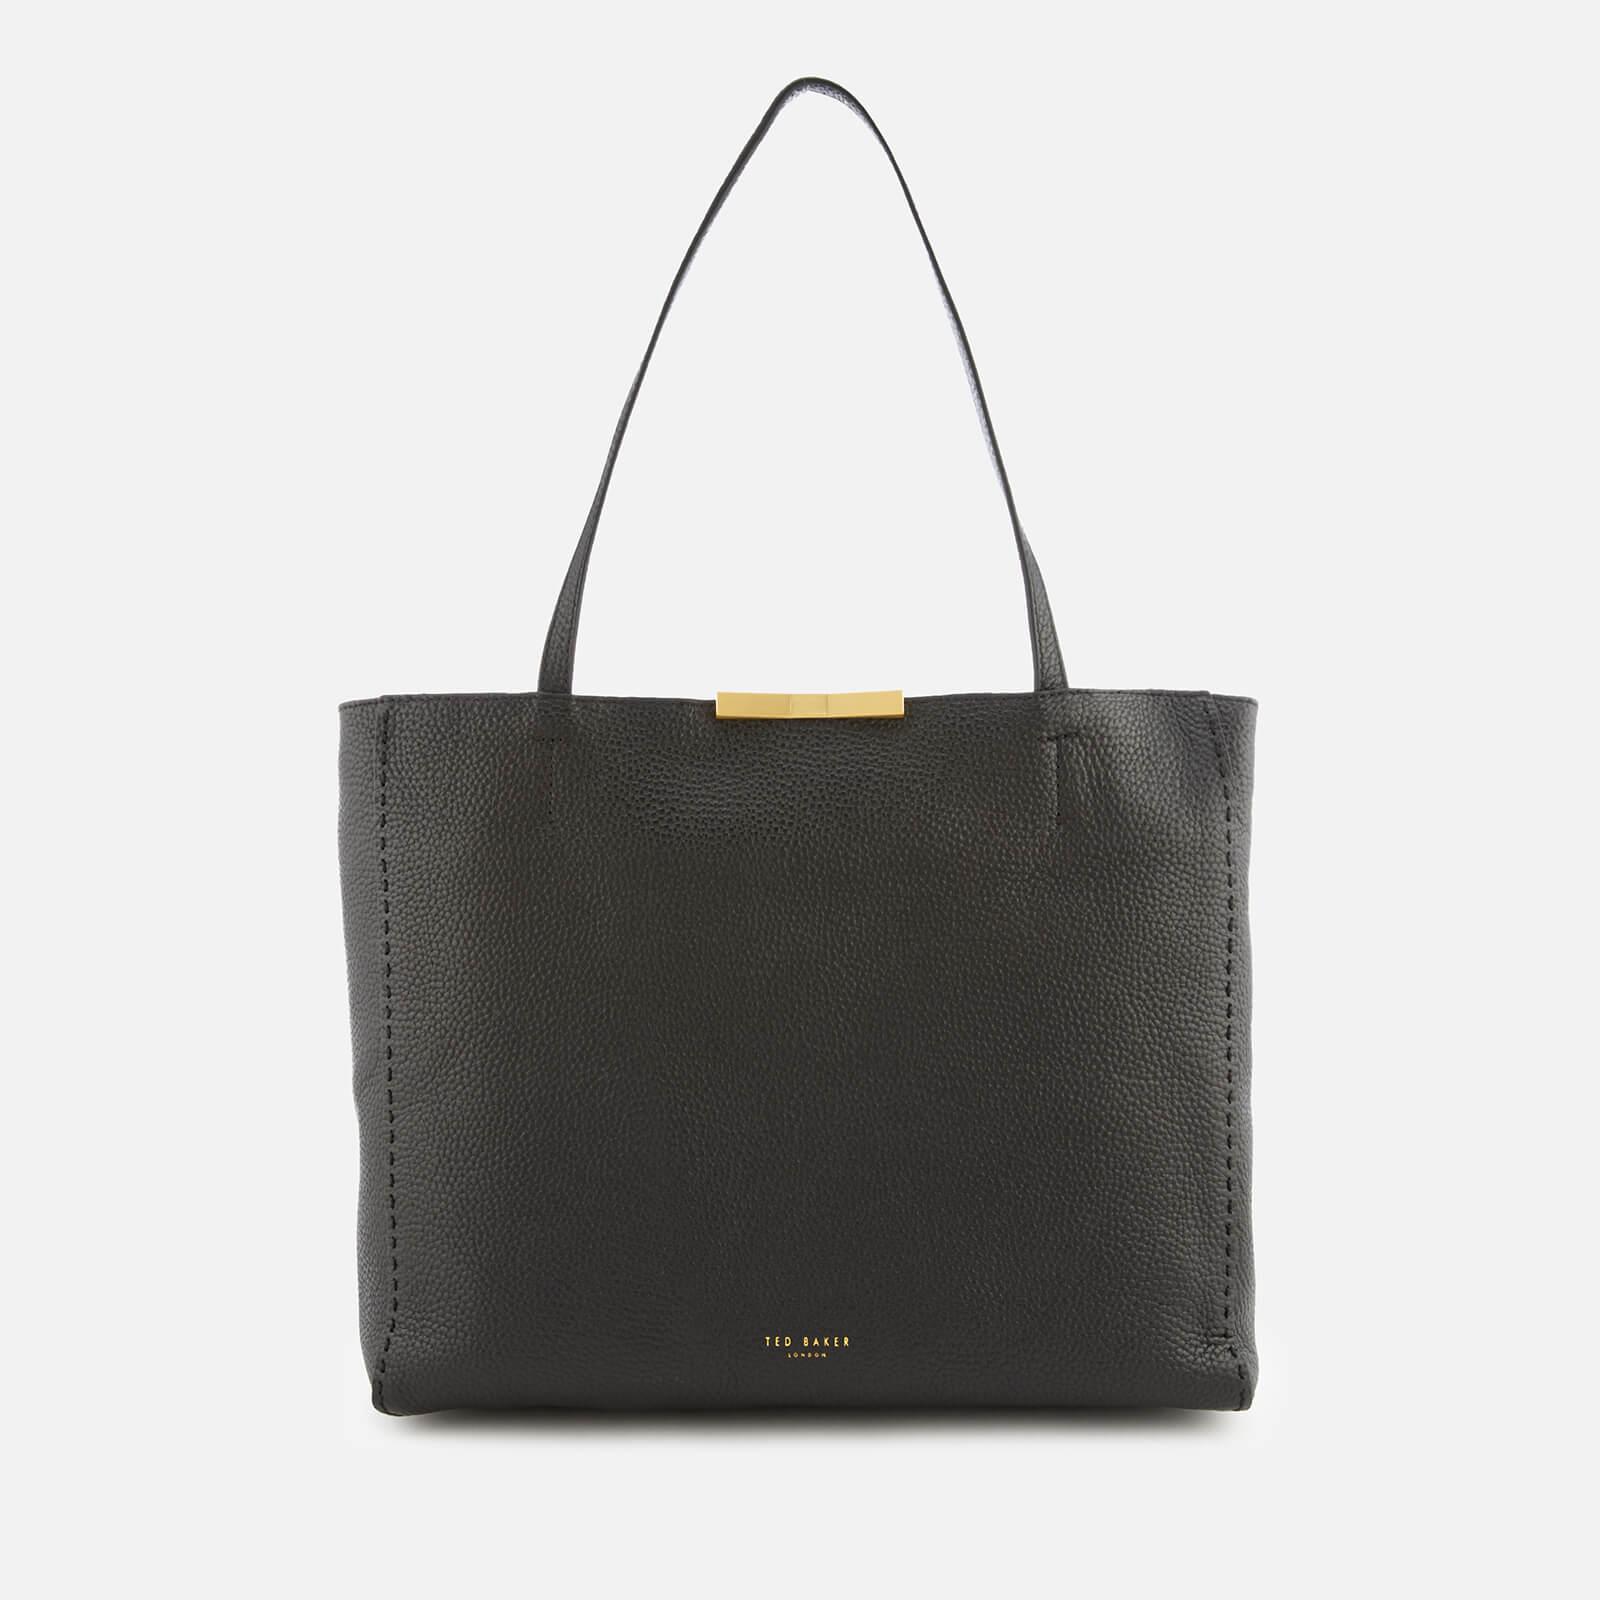 7ca889f12 Ted Baker Women s Caullie Bow Detail Soft Shopper Bag - Black Womens  Accessories